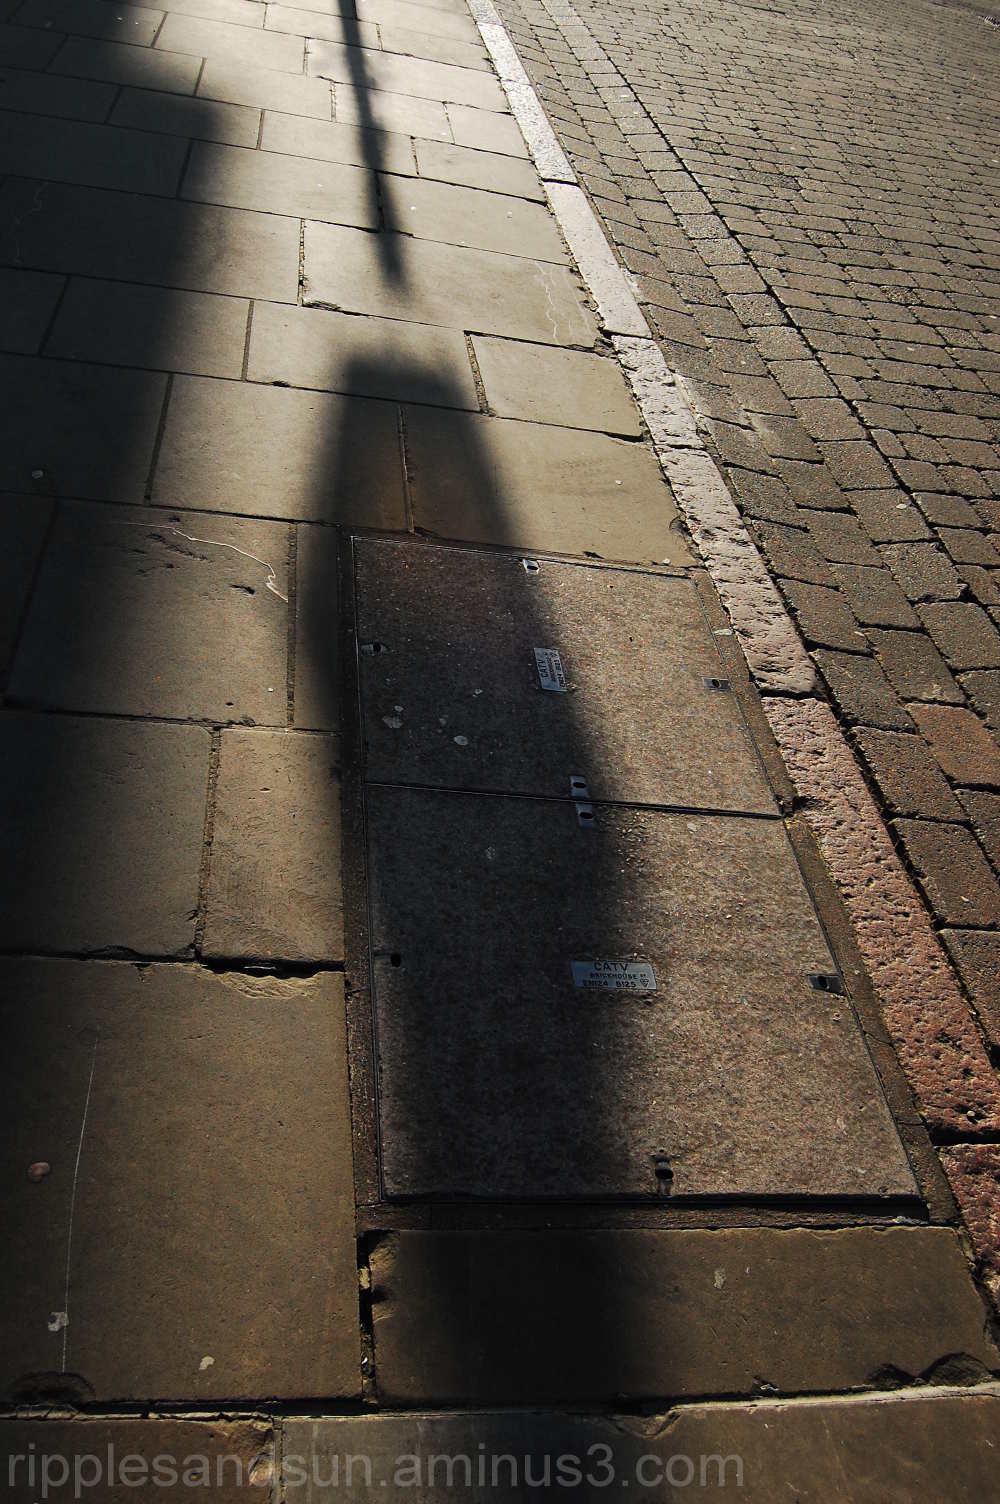 Street lamp shade